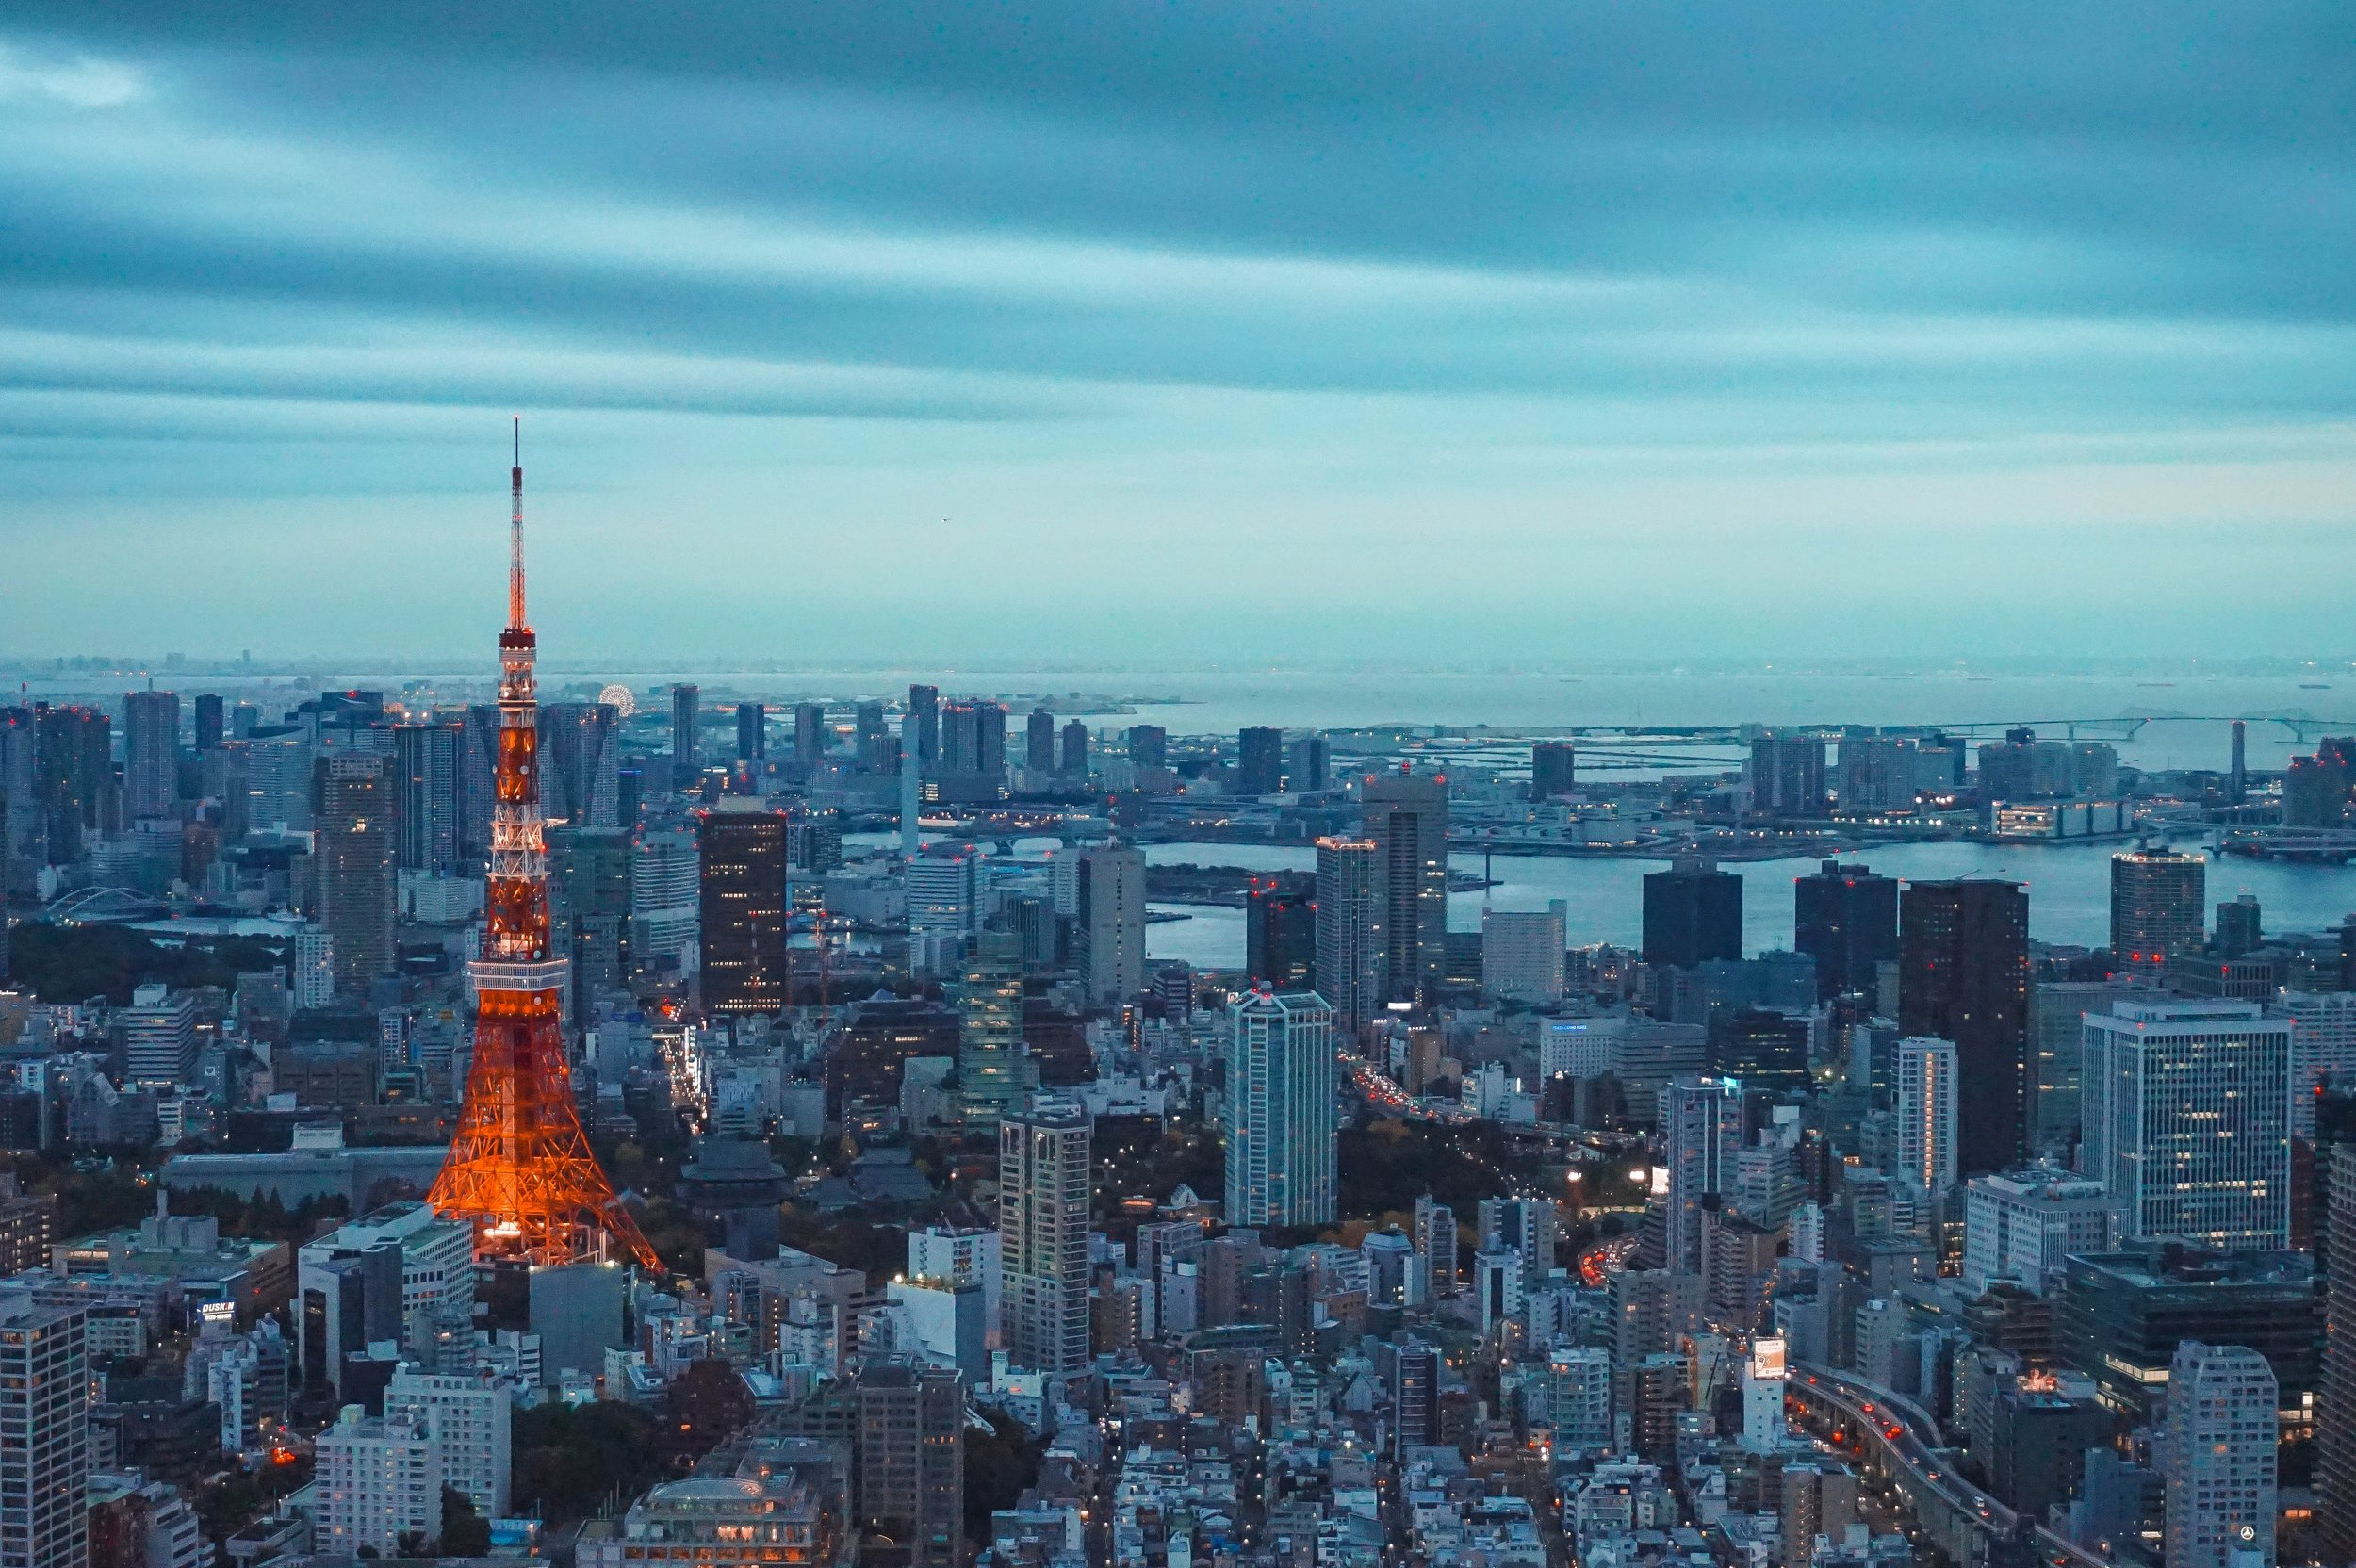 Skyline of Tokyo. Photo credit by Unsplash